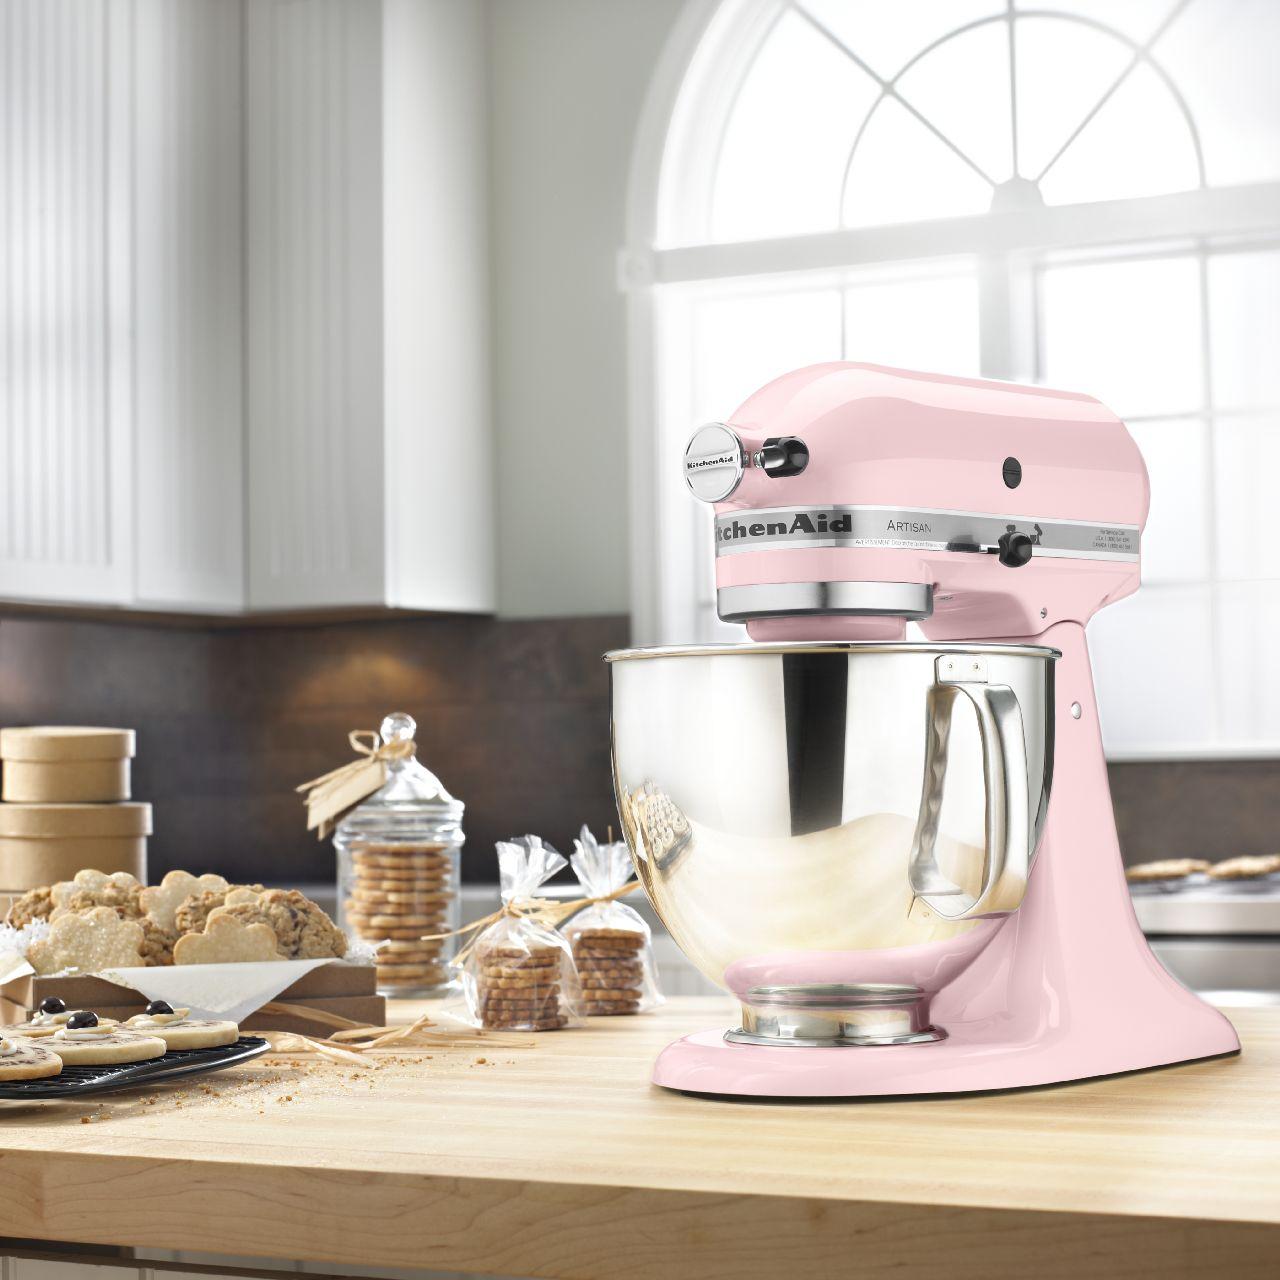 KitchenAid KSM150PSPK Artisan® Series Pink 5 Quart Stand Mixer